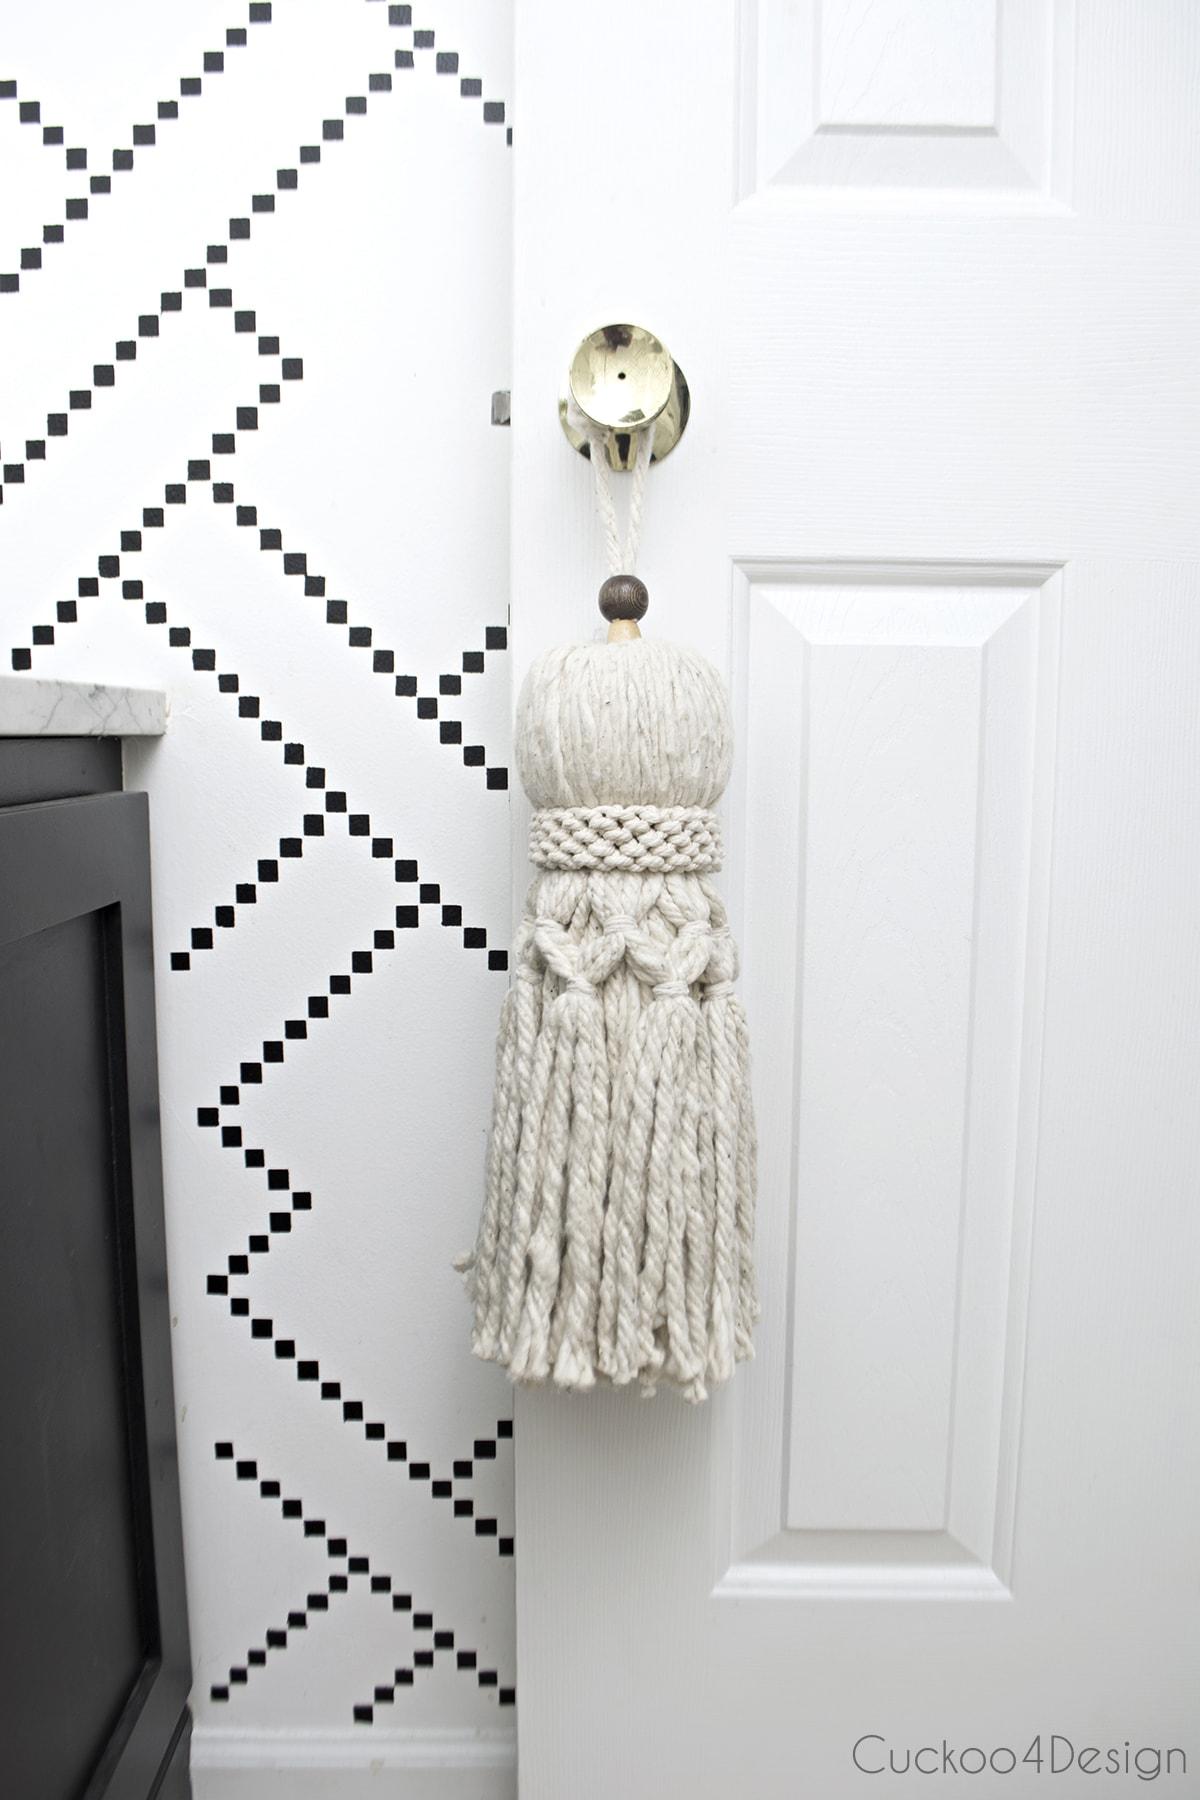 How to make your own huge oversized tassel | DIY huge tassel for $9 | tassel made from mop | affordable DIY tassel